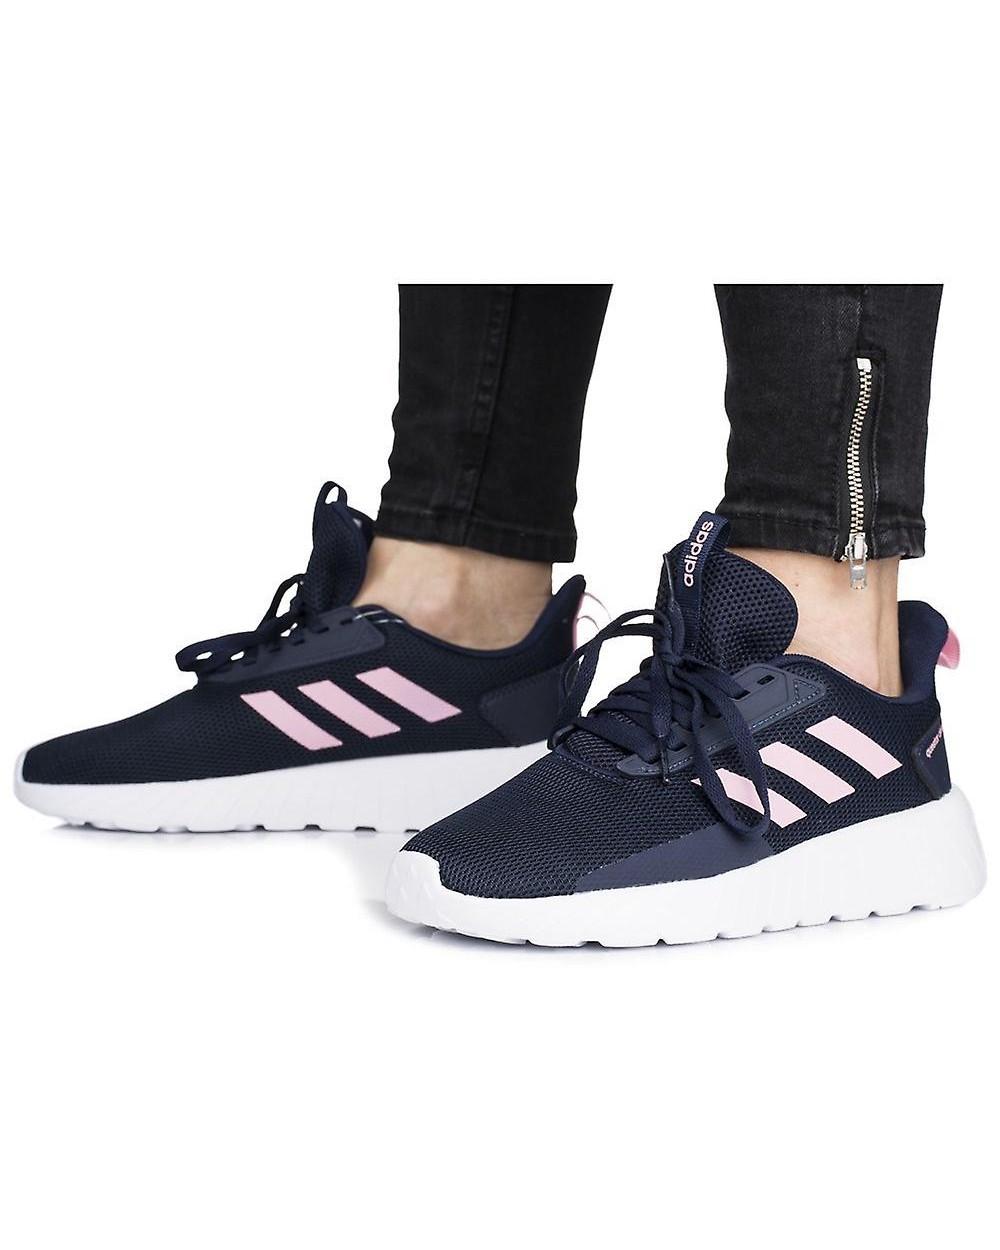 finest selection 1c72f 402c5 ... Adidas chaussures gymnastique gymnastique gymnastique sportif Sneakers  Questar Drive Femme bleu 392488 ...